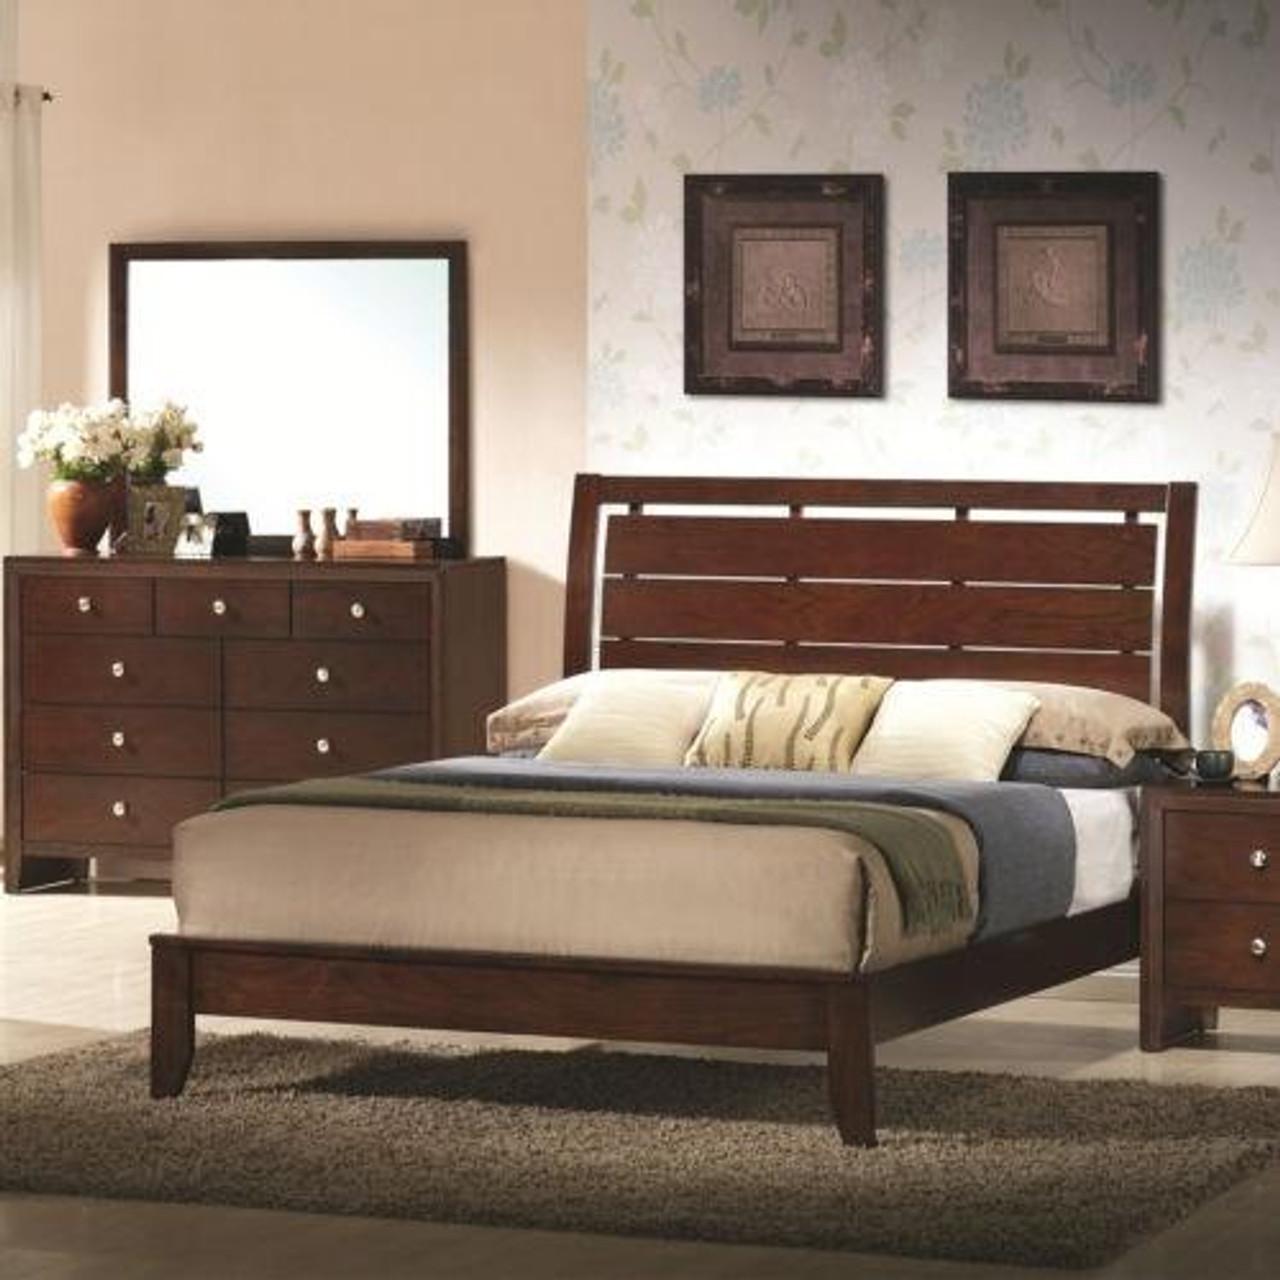 Home Furniture Bed Frame With Platform Wood Slats Tall Headboard King Size Hw58989